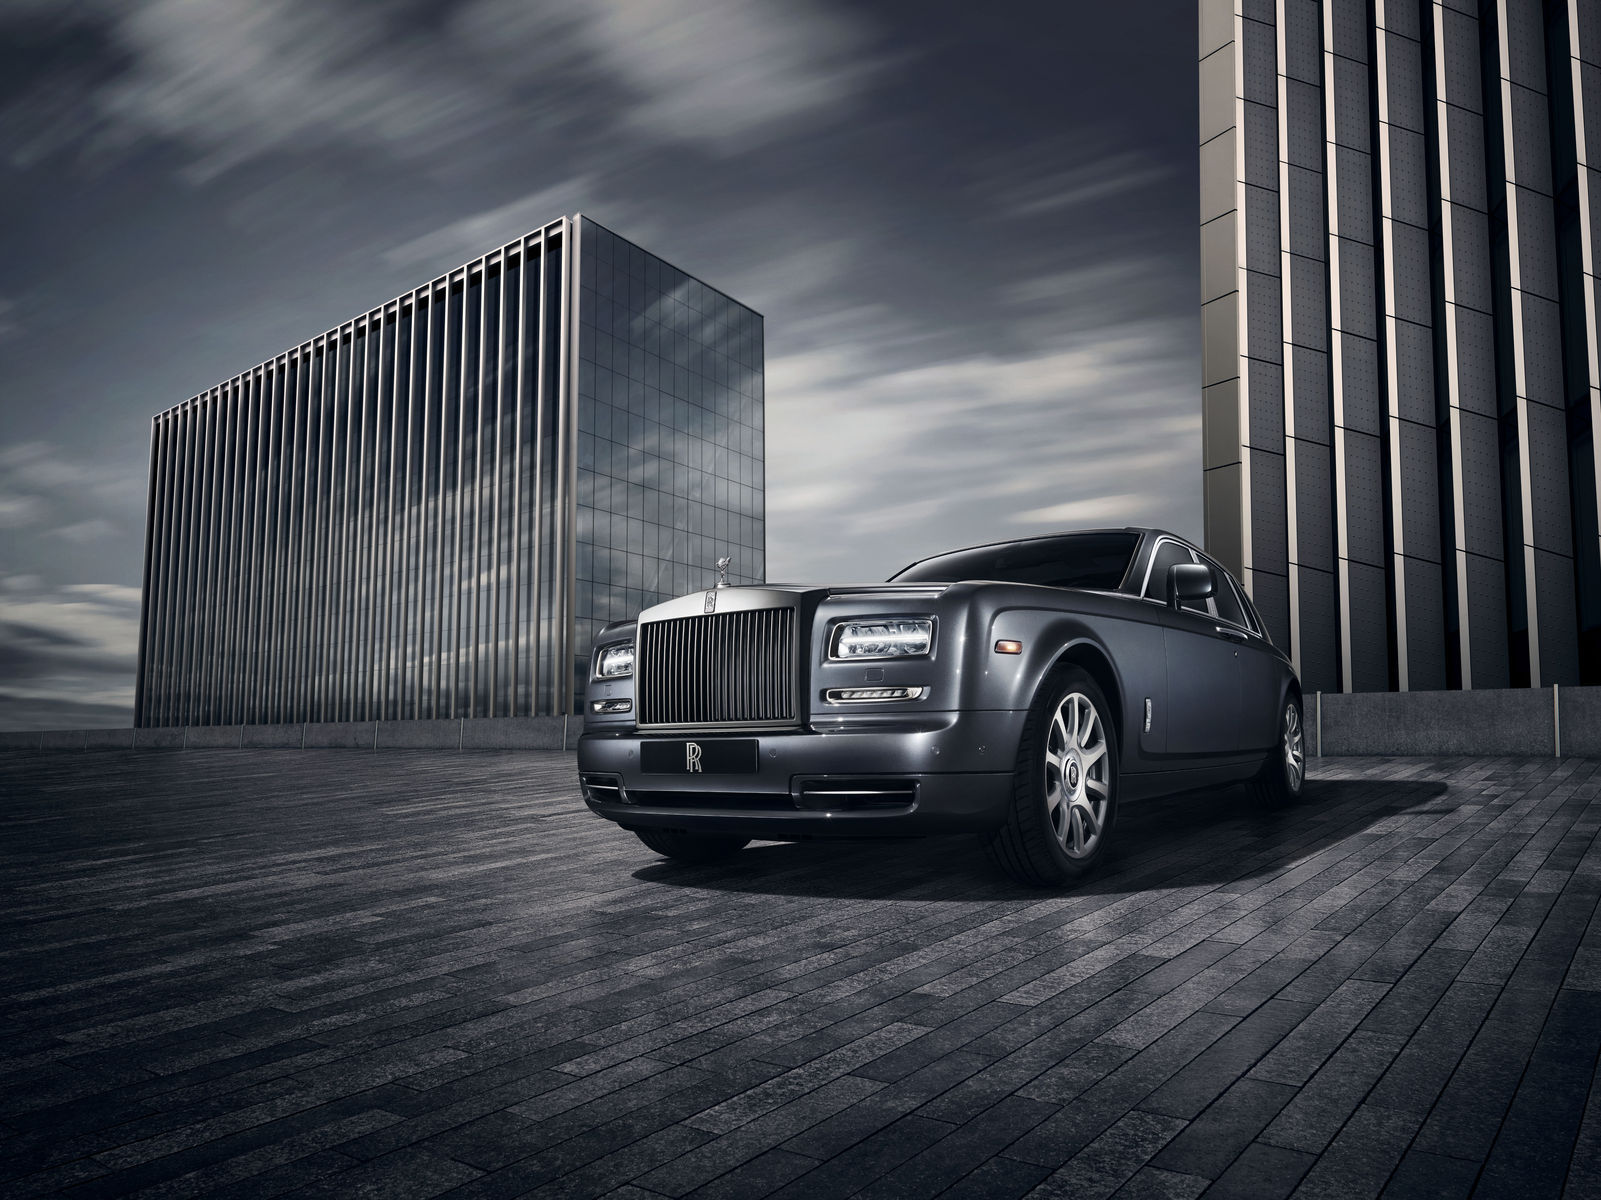 Rolls-Royce Phantom | Rolls-Royce Phantom Metropolitan Collection